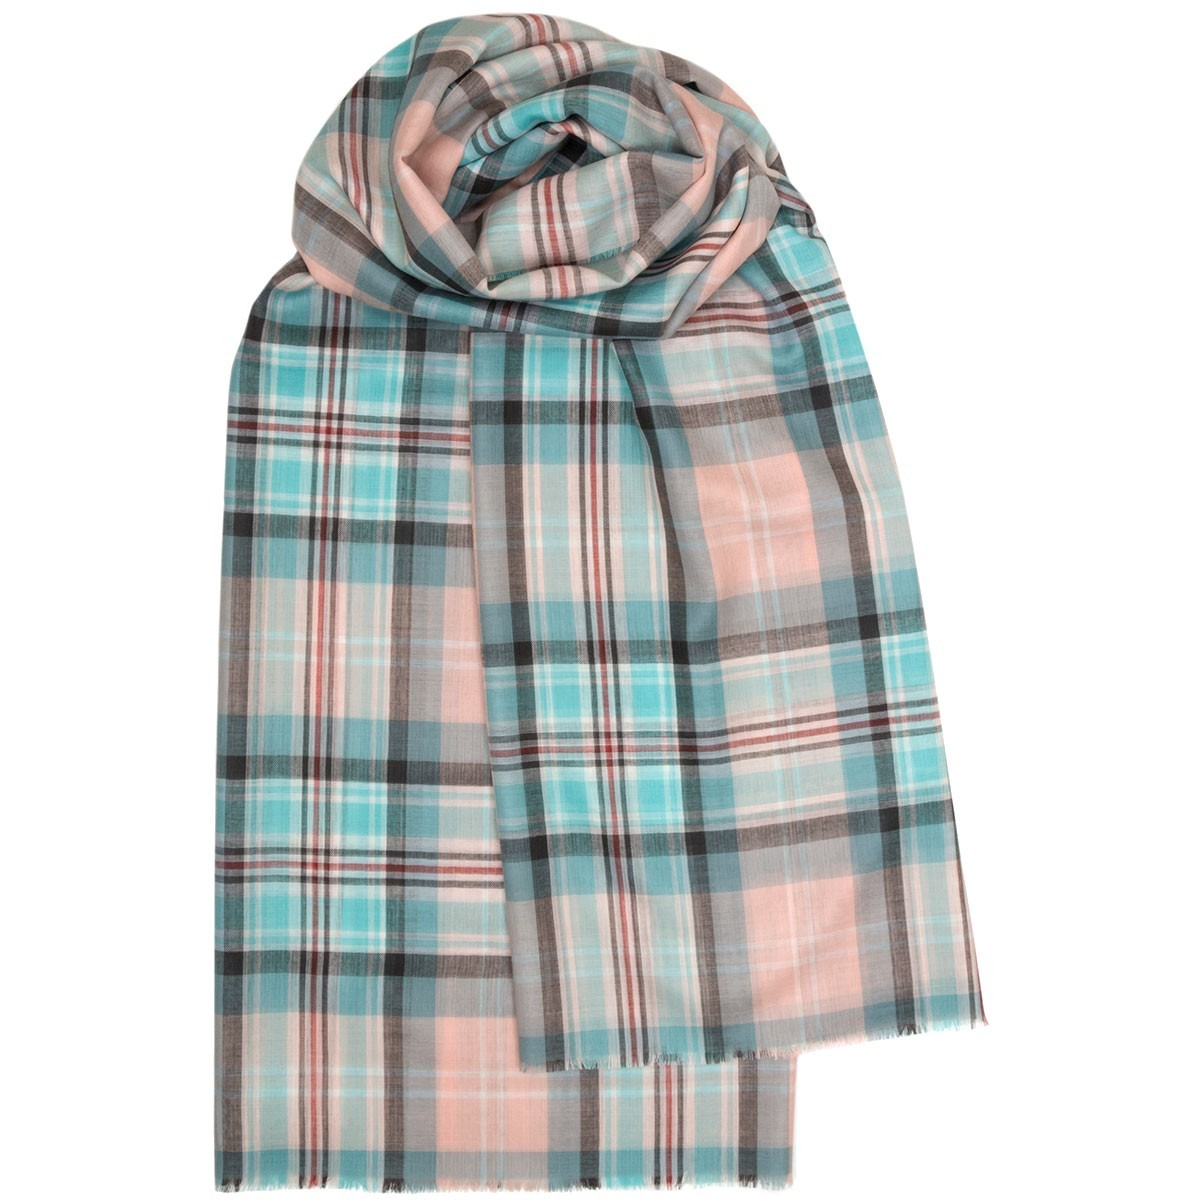 Lochcarron Peter Rabbit Tartan Wool Make-Up Bag/ Pencil Case - Made in Scotland